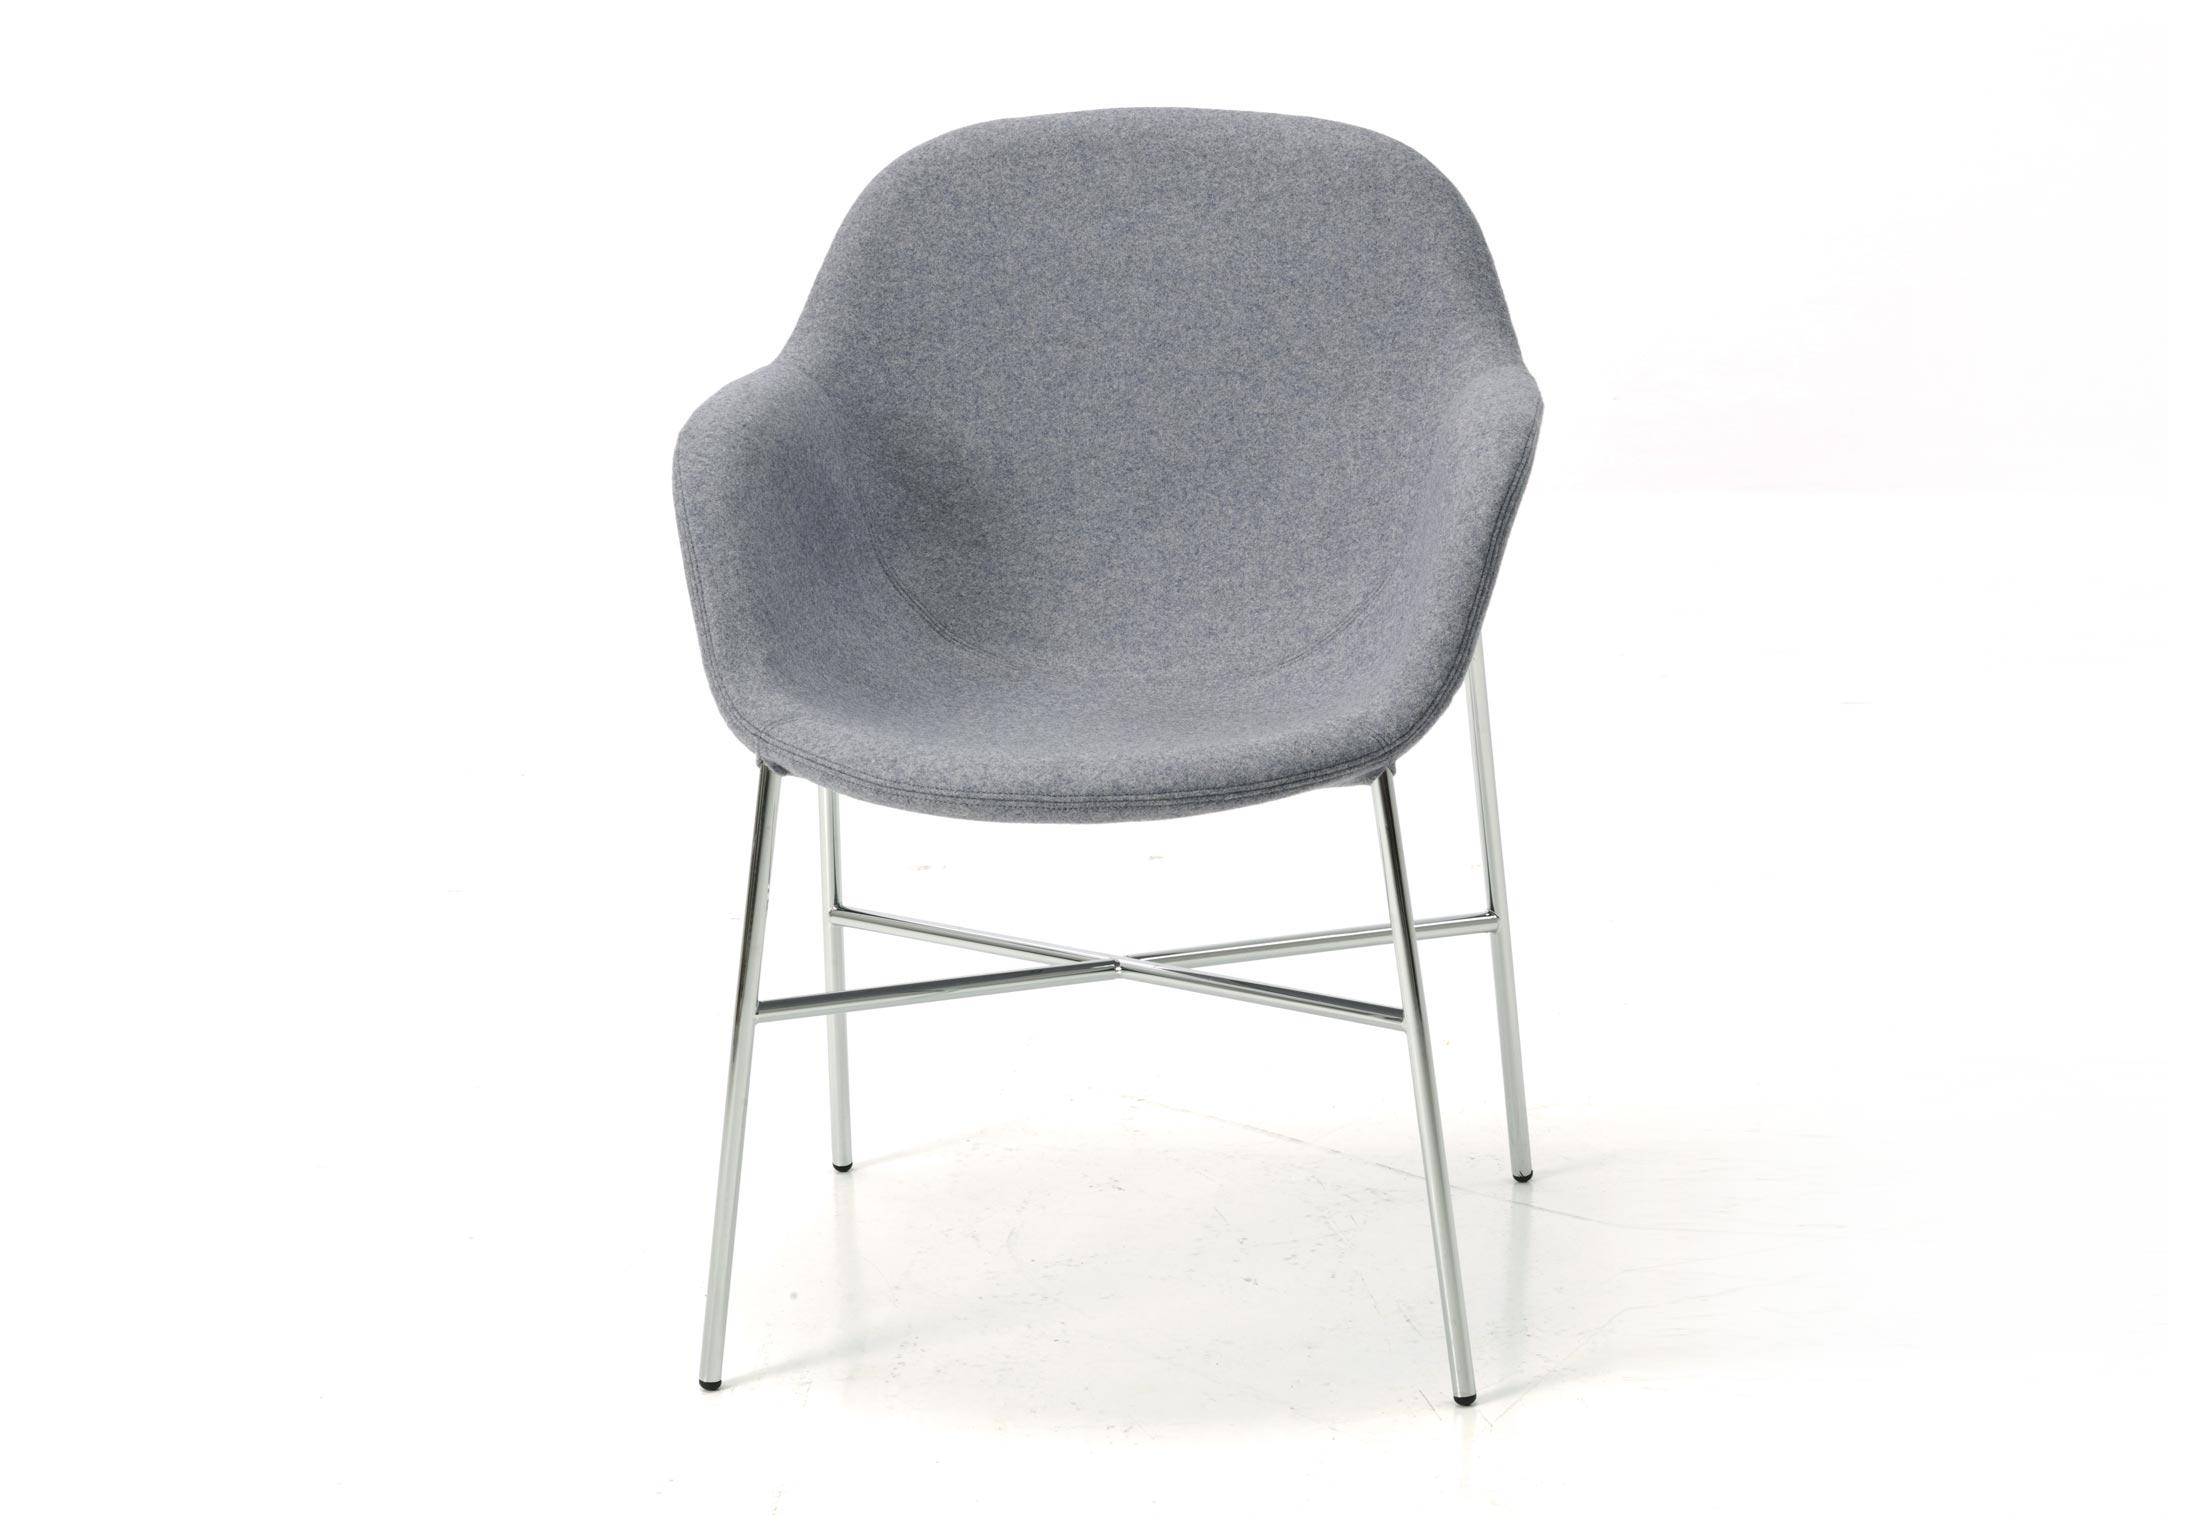 small arm chair oxo high recall tia maria by moroso stylepark